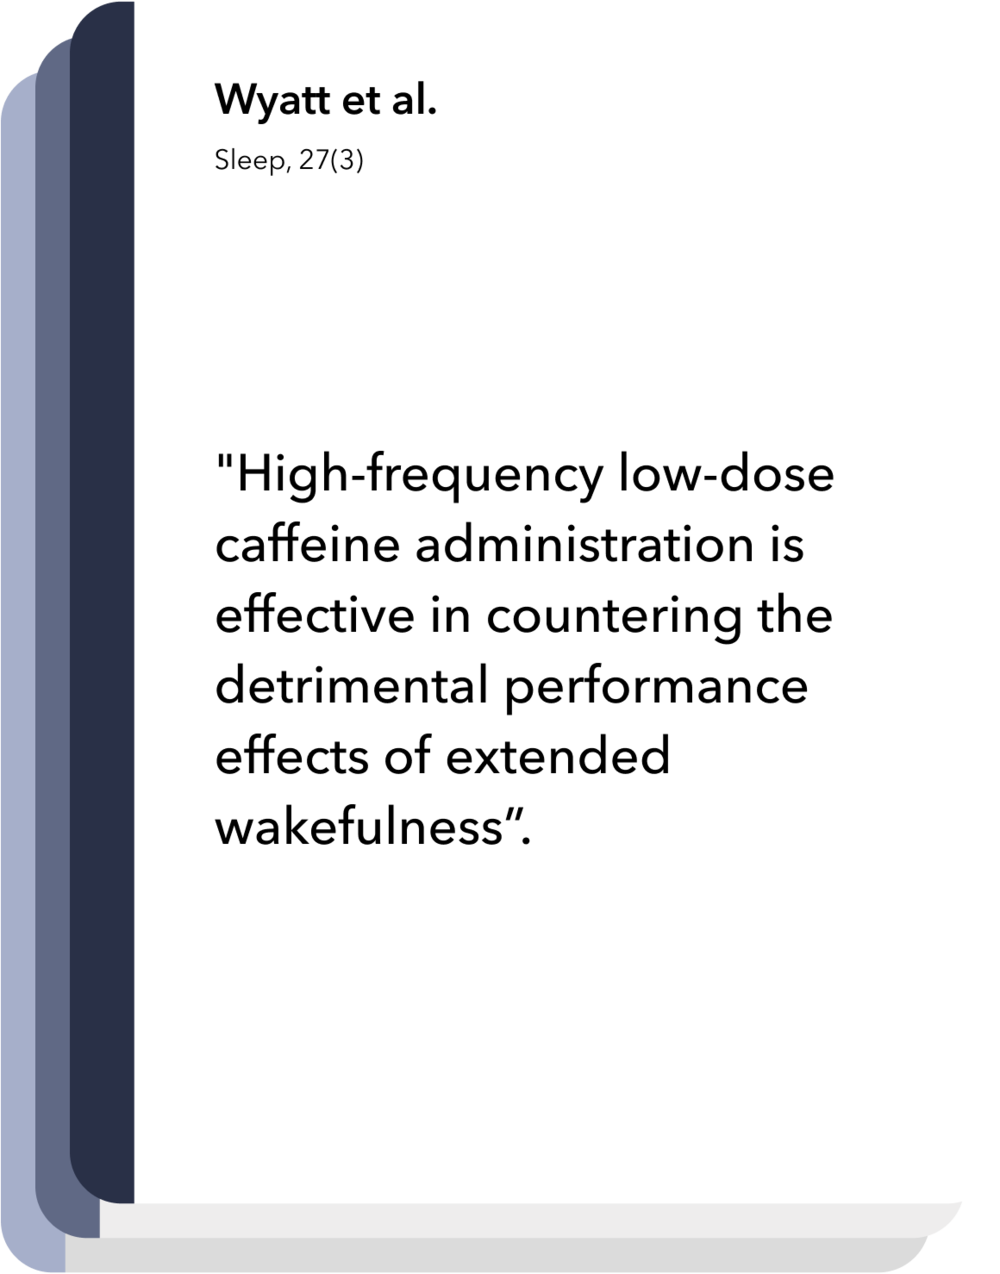 Latest research in sleep and circadian neuroscience: Caffeine